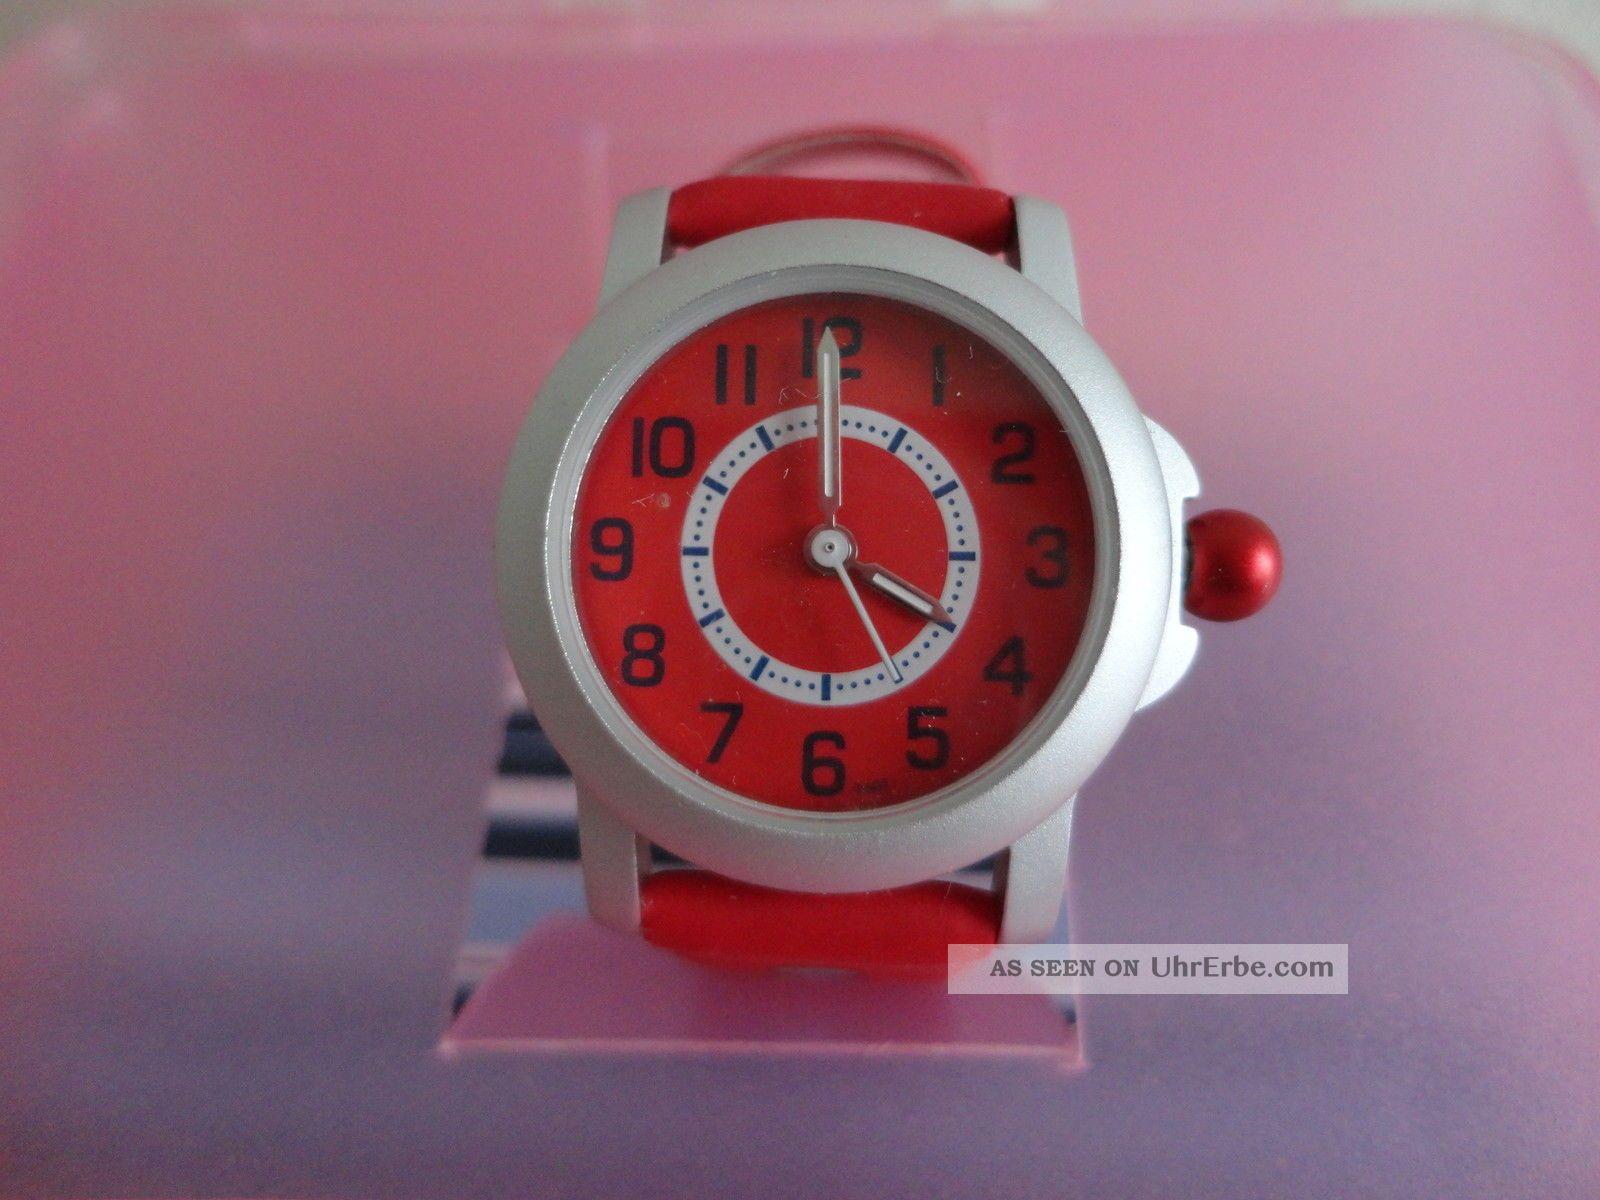 Armbanduhr kinder esprit  Armbanduhr Esprit Kind Rot Mädchen Oder Junge Mit Ovp Und Beilage